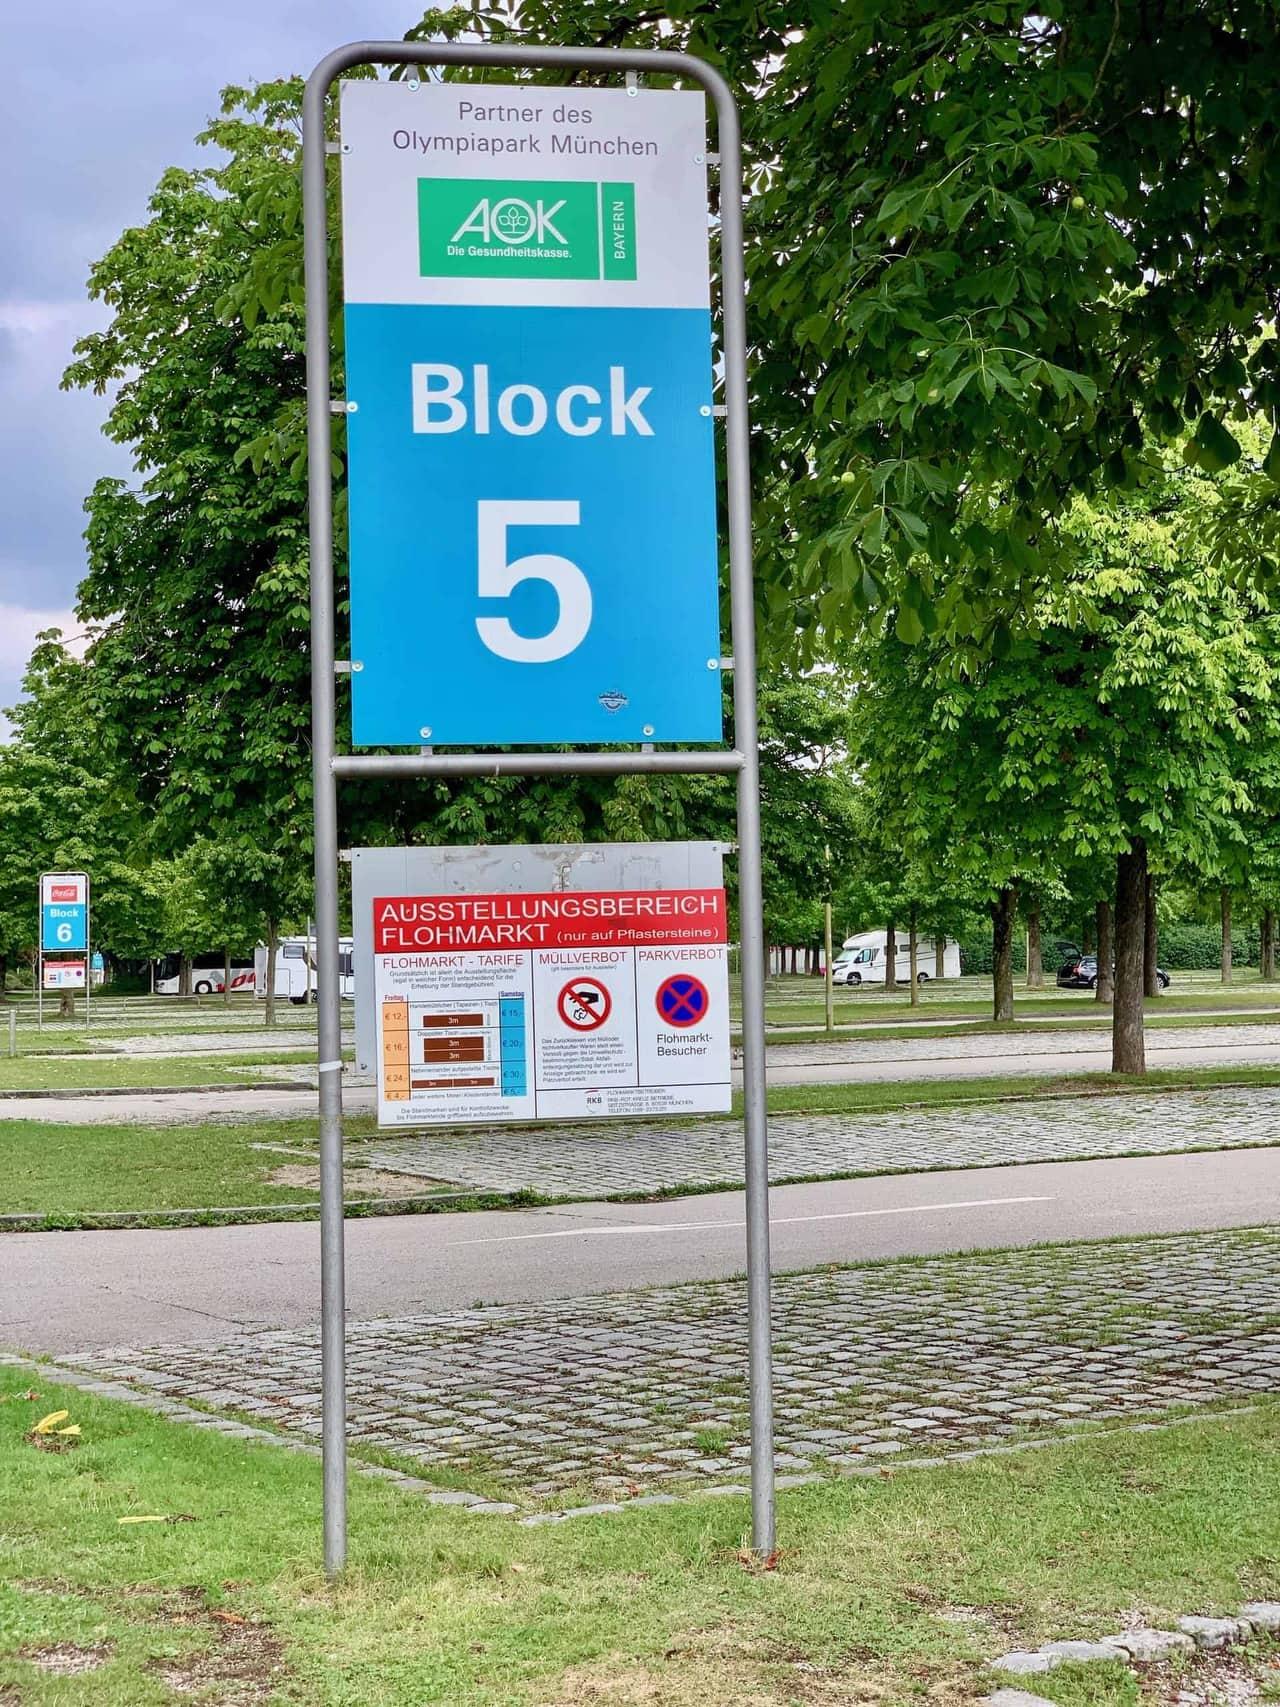 Olympiapark_Parkharfe_Wohnmobilstellplatz_Flomarkt_Sperrung